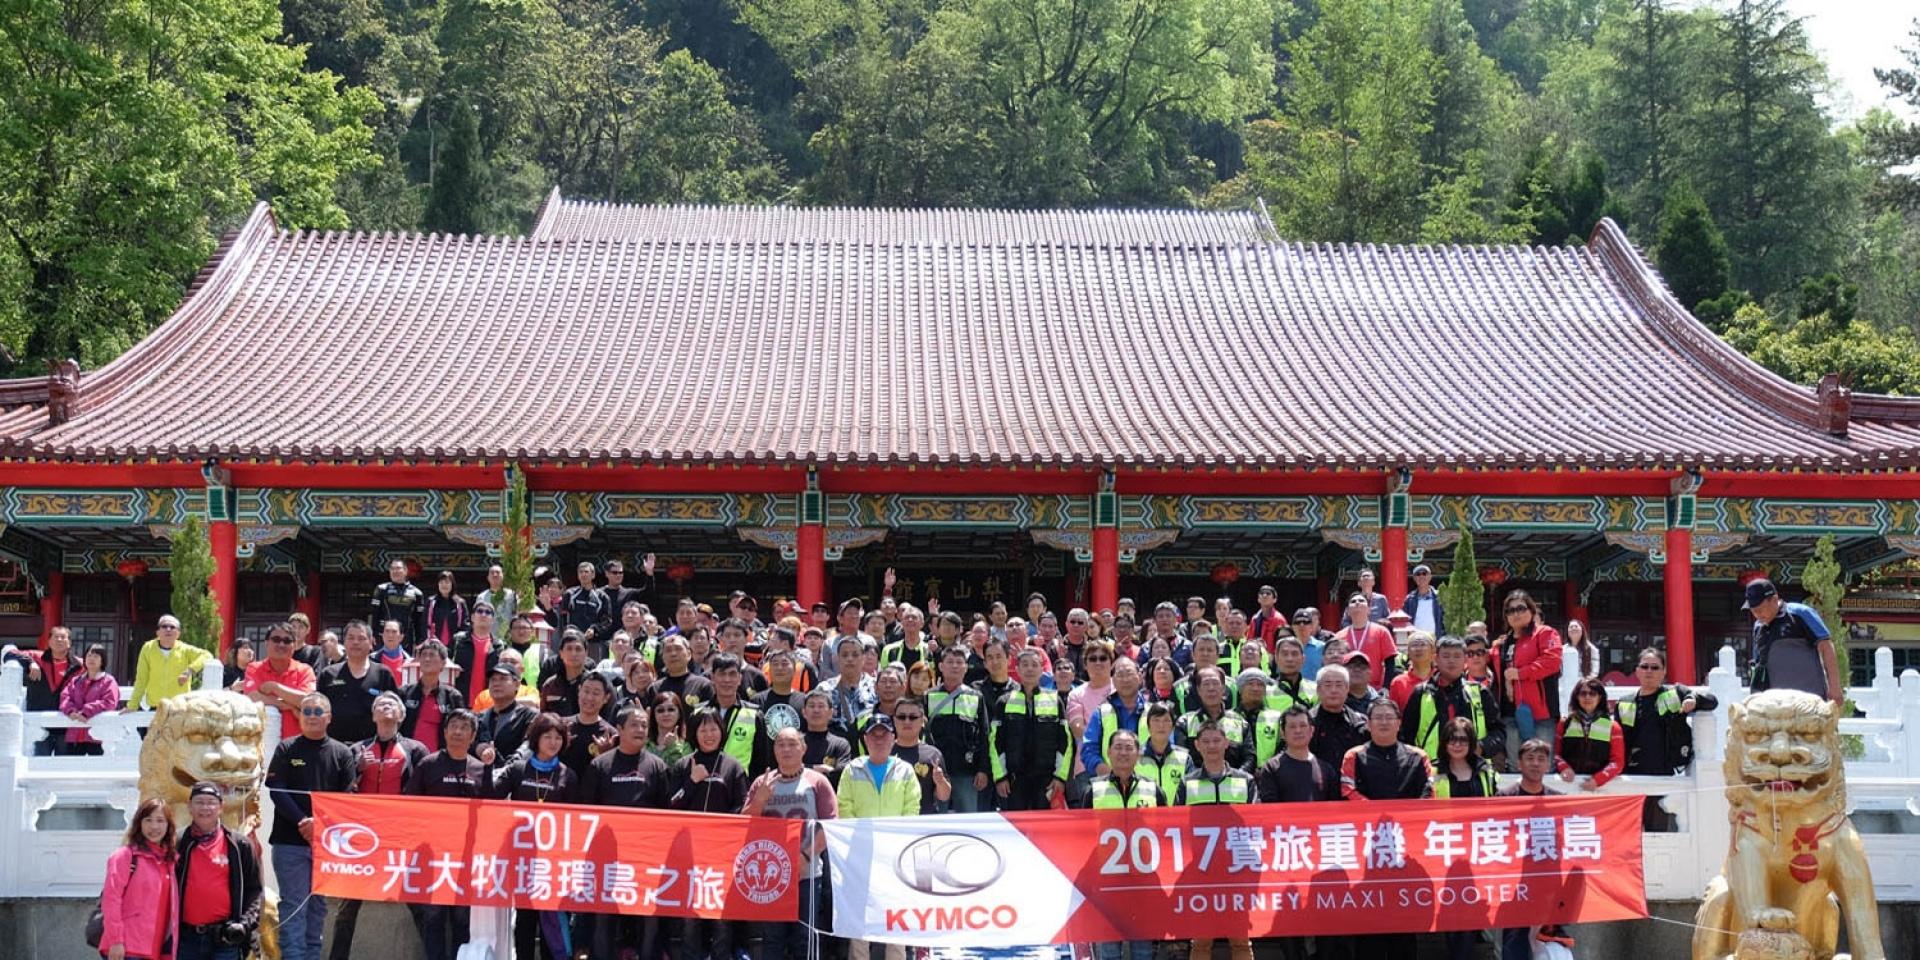 2017 KYMCO覺旅環島 南北車友齊聚梨山